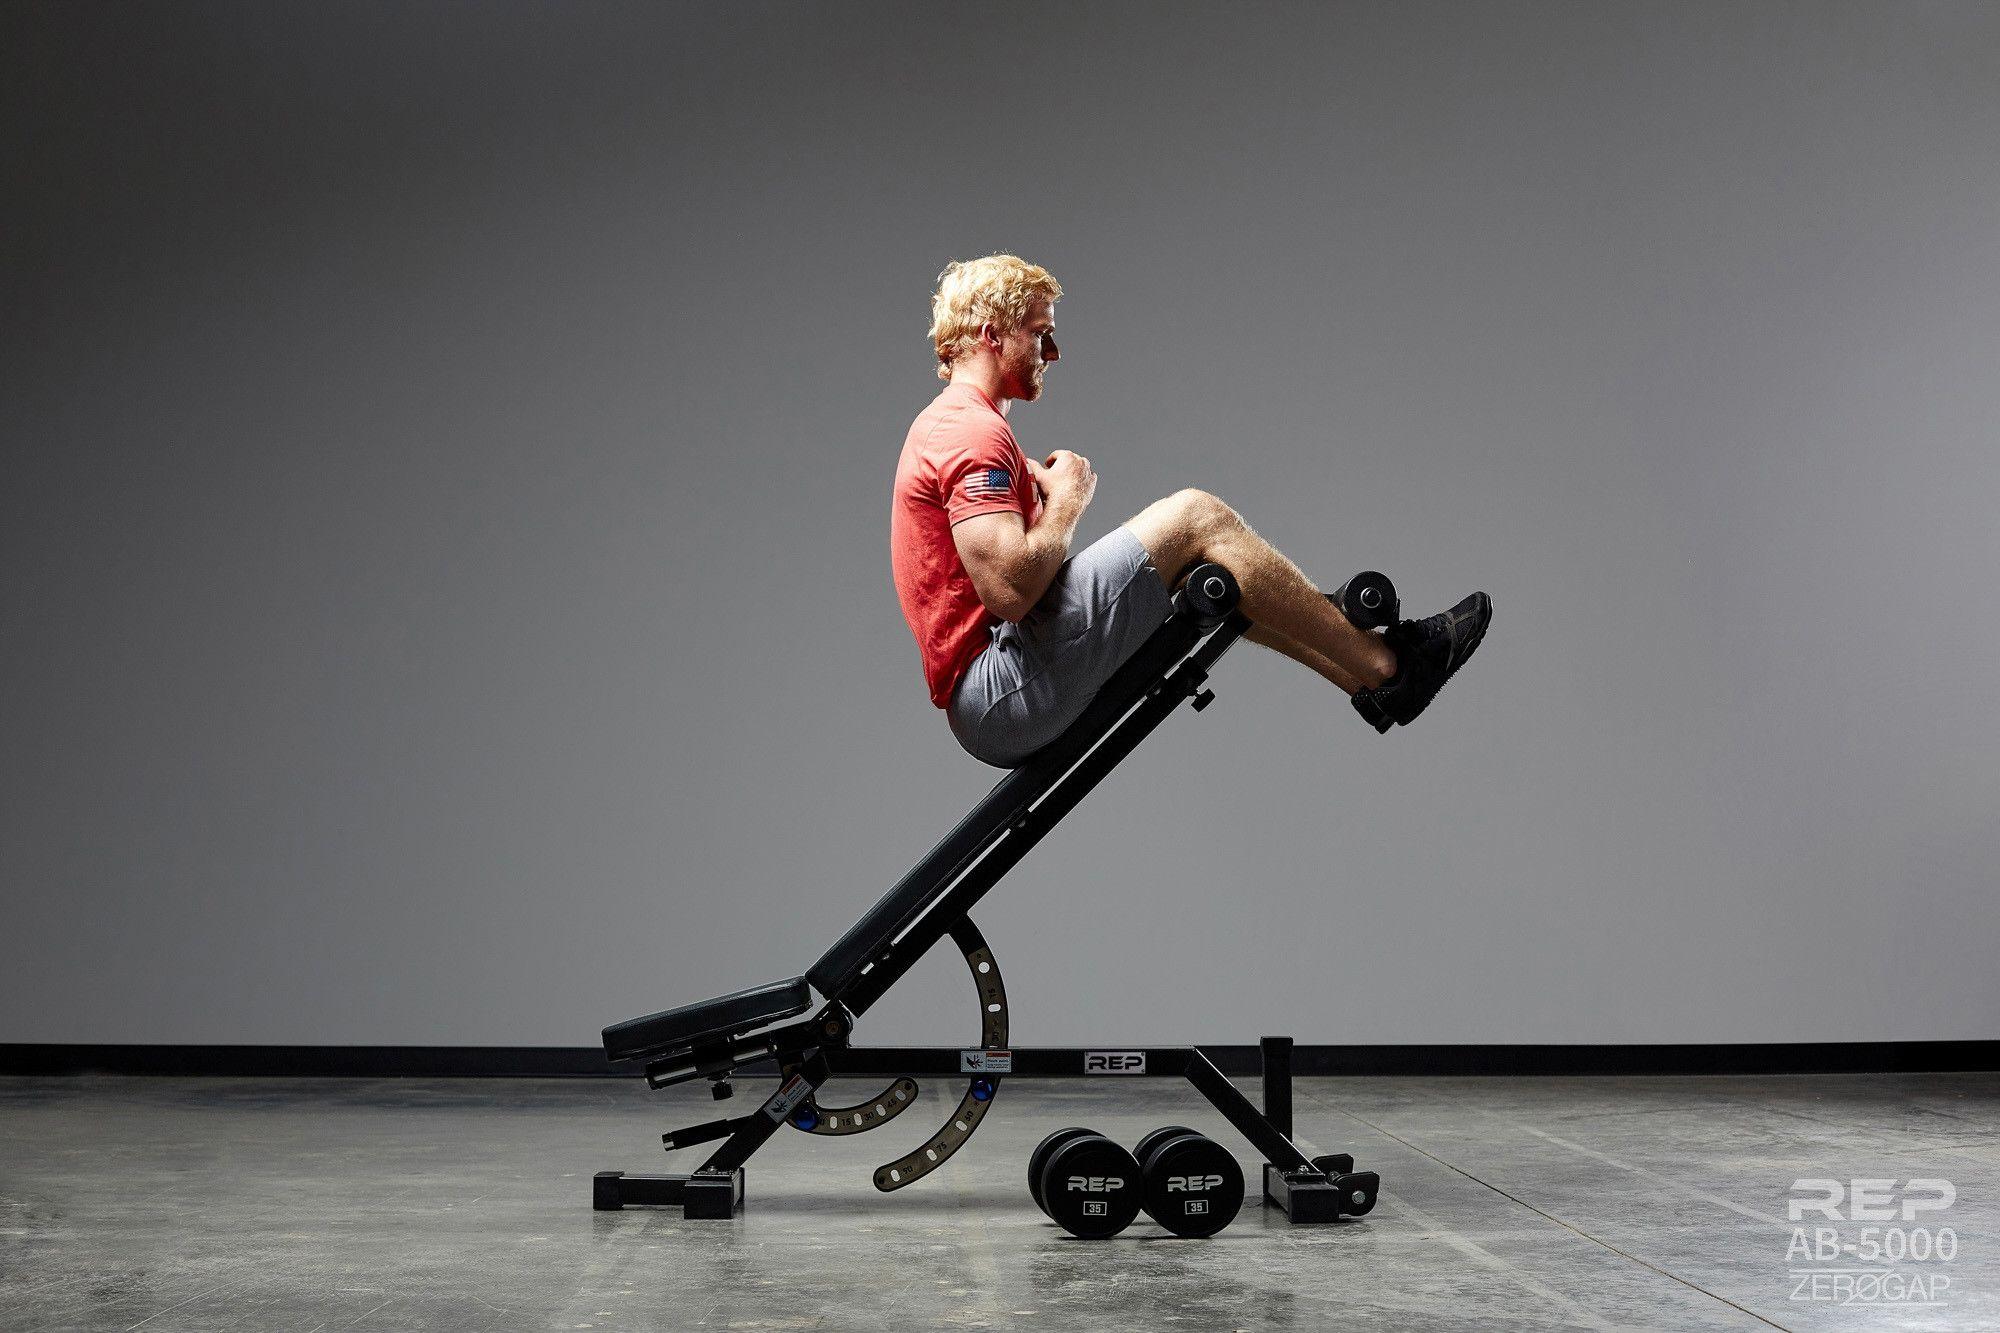 Ab 5000 Zero Gap Adjustable Bench Weight Benches Gym No Equipment Workout